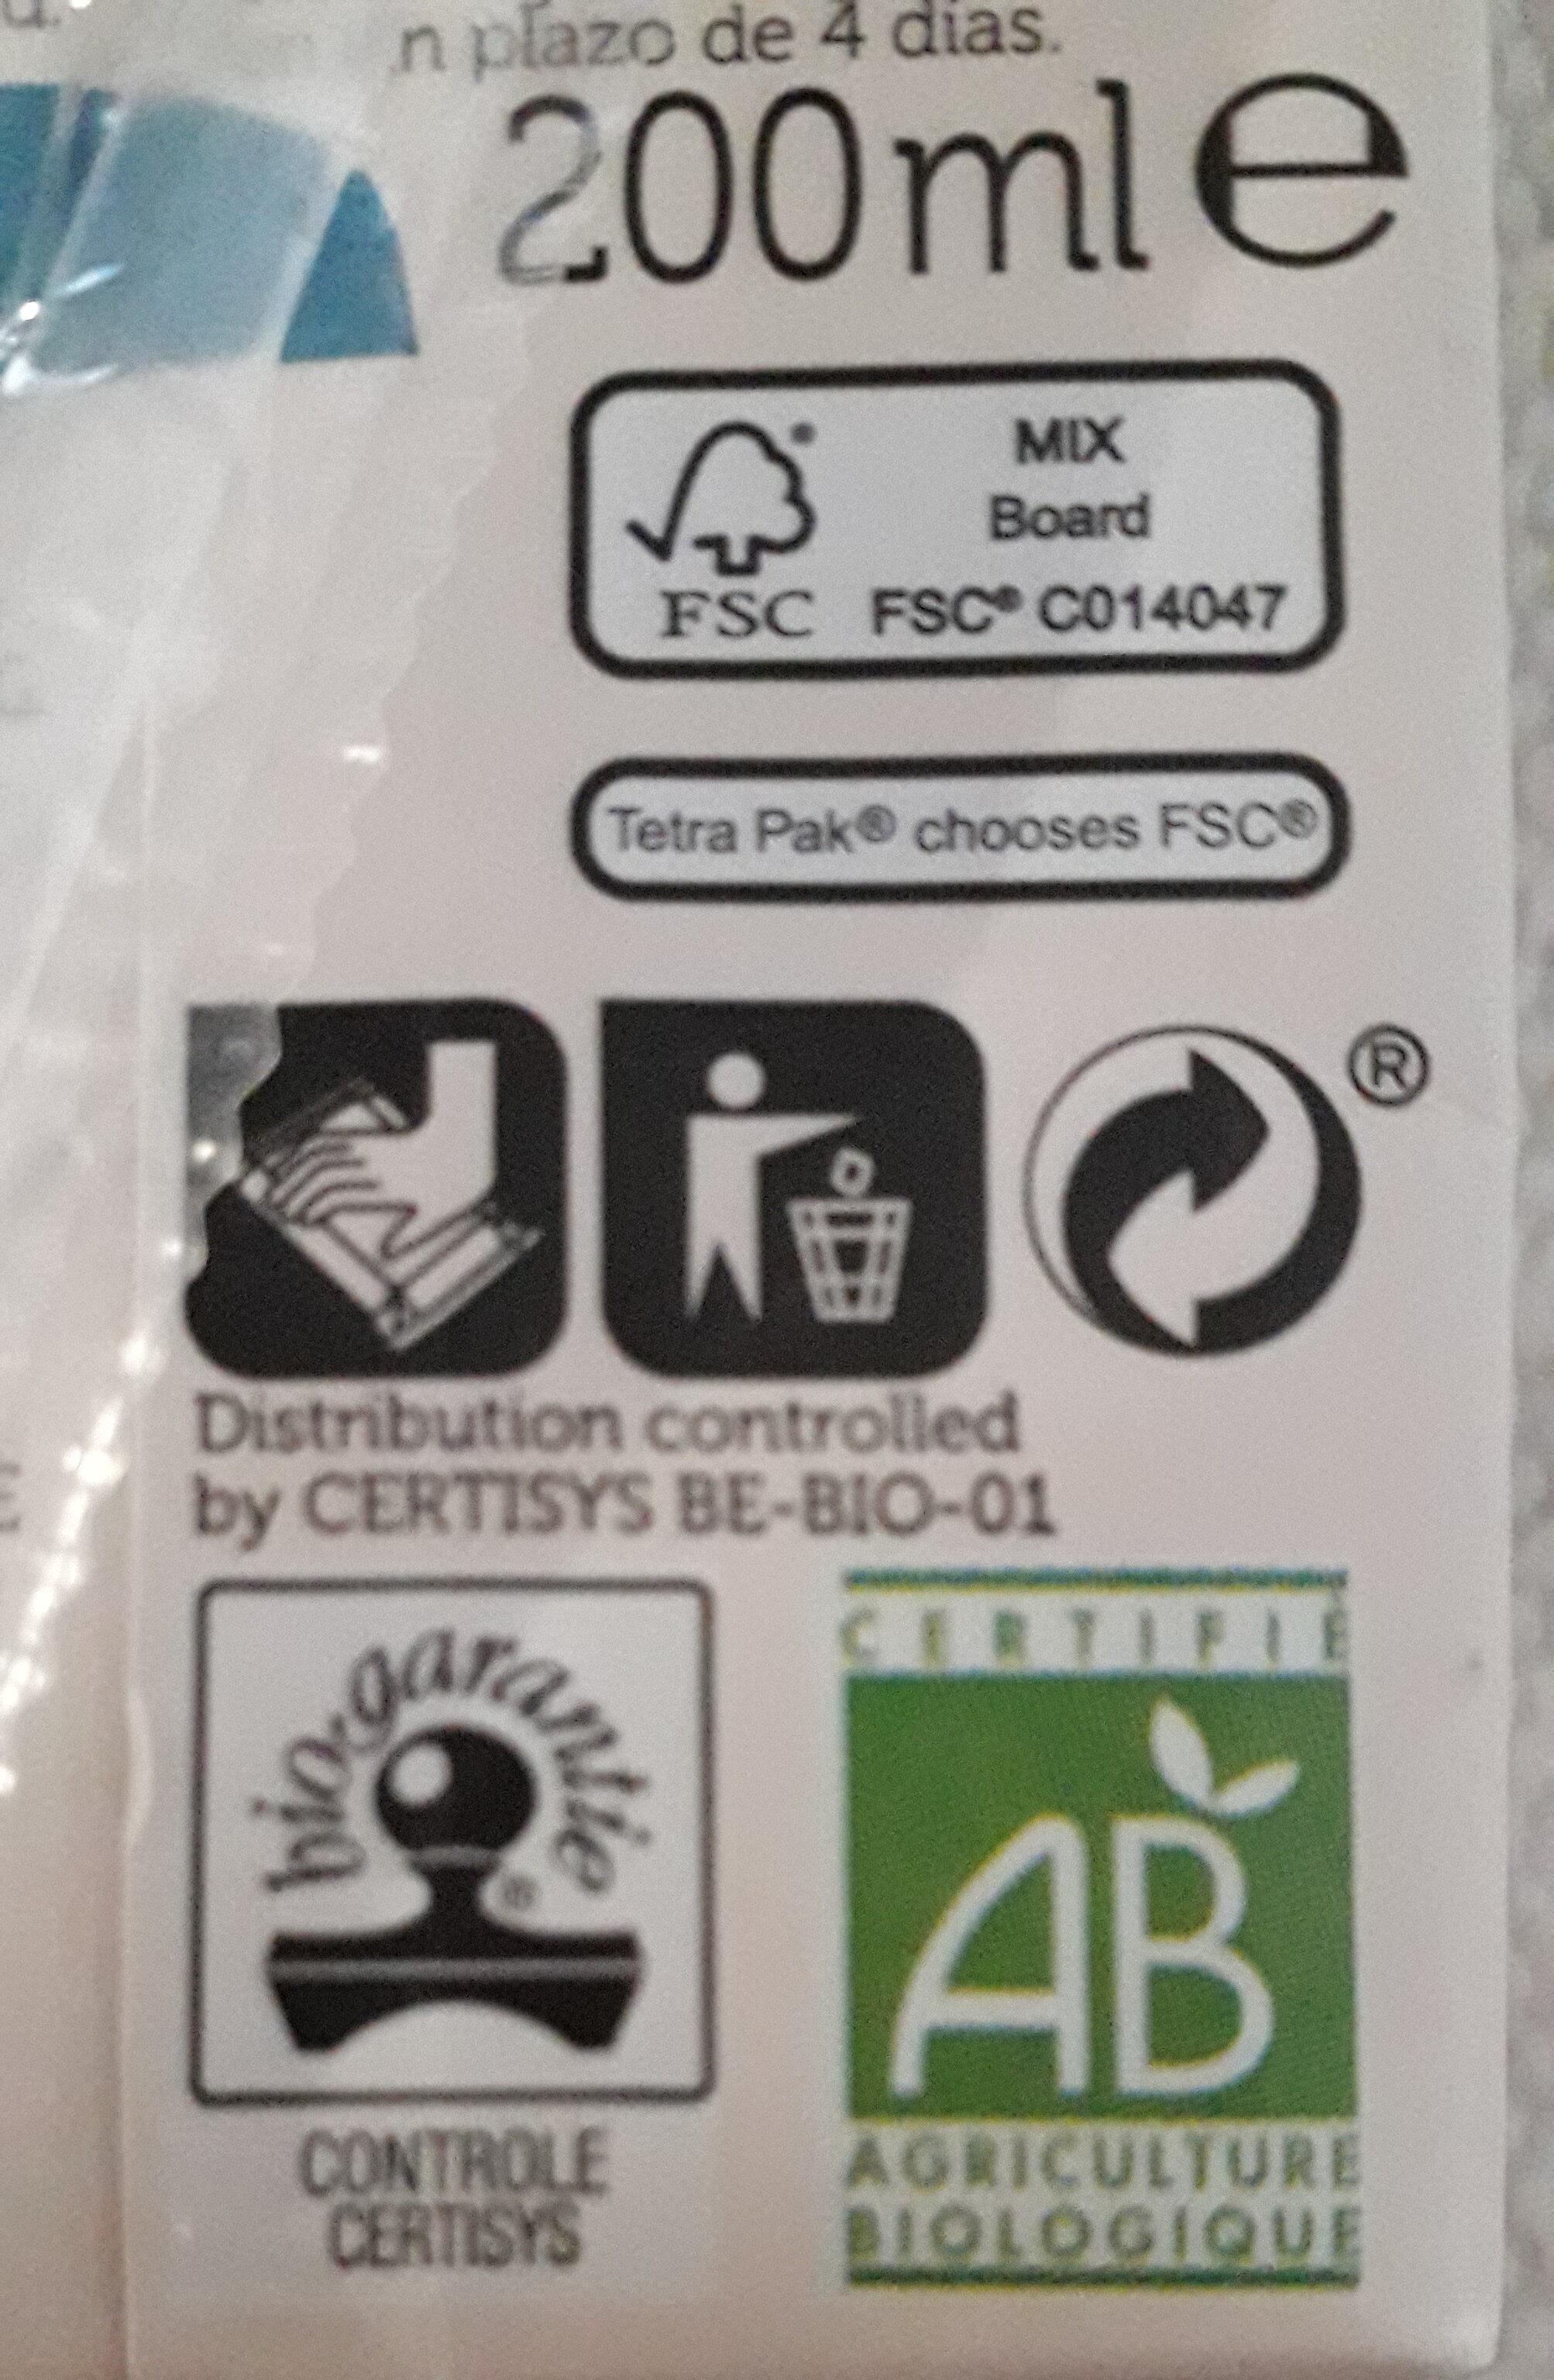 Drink coco - Instruction de recyclage et/ou informations d'emballage - fr